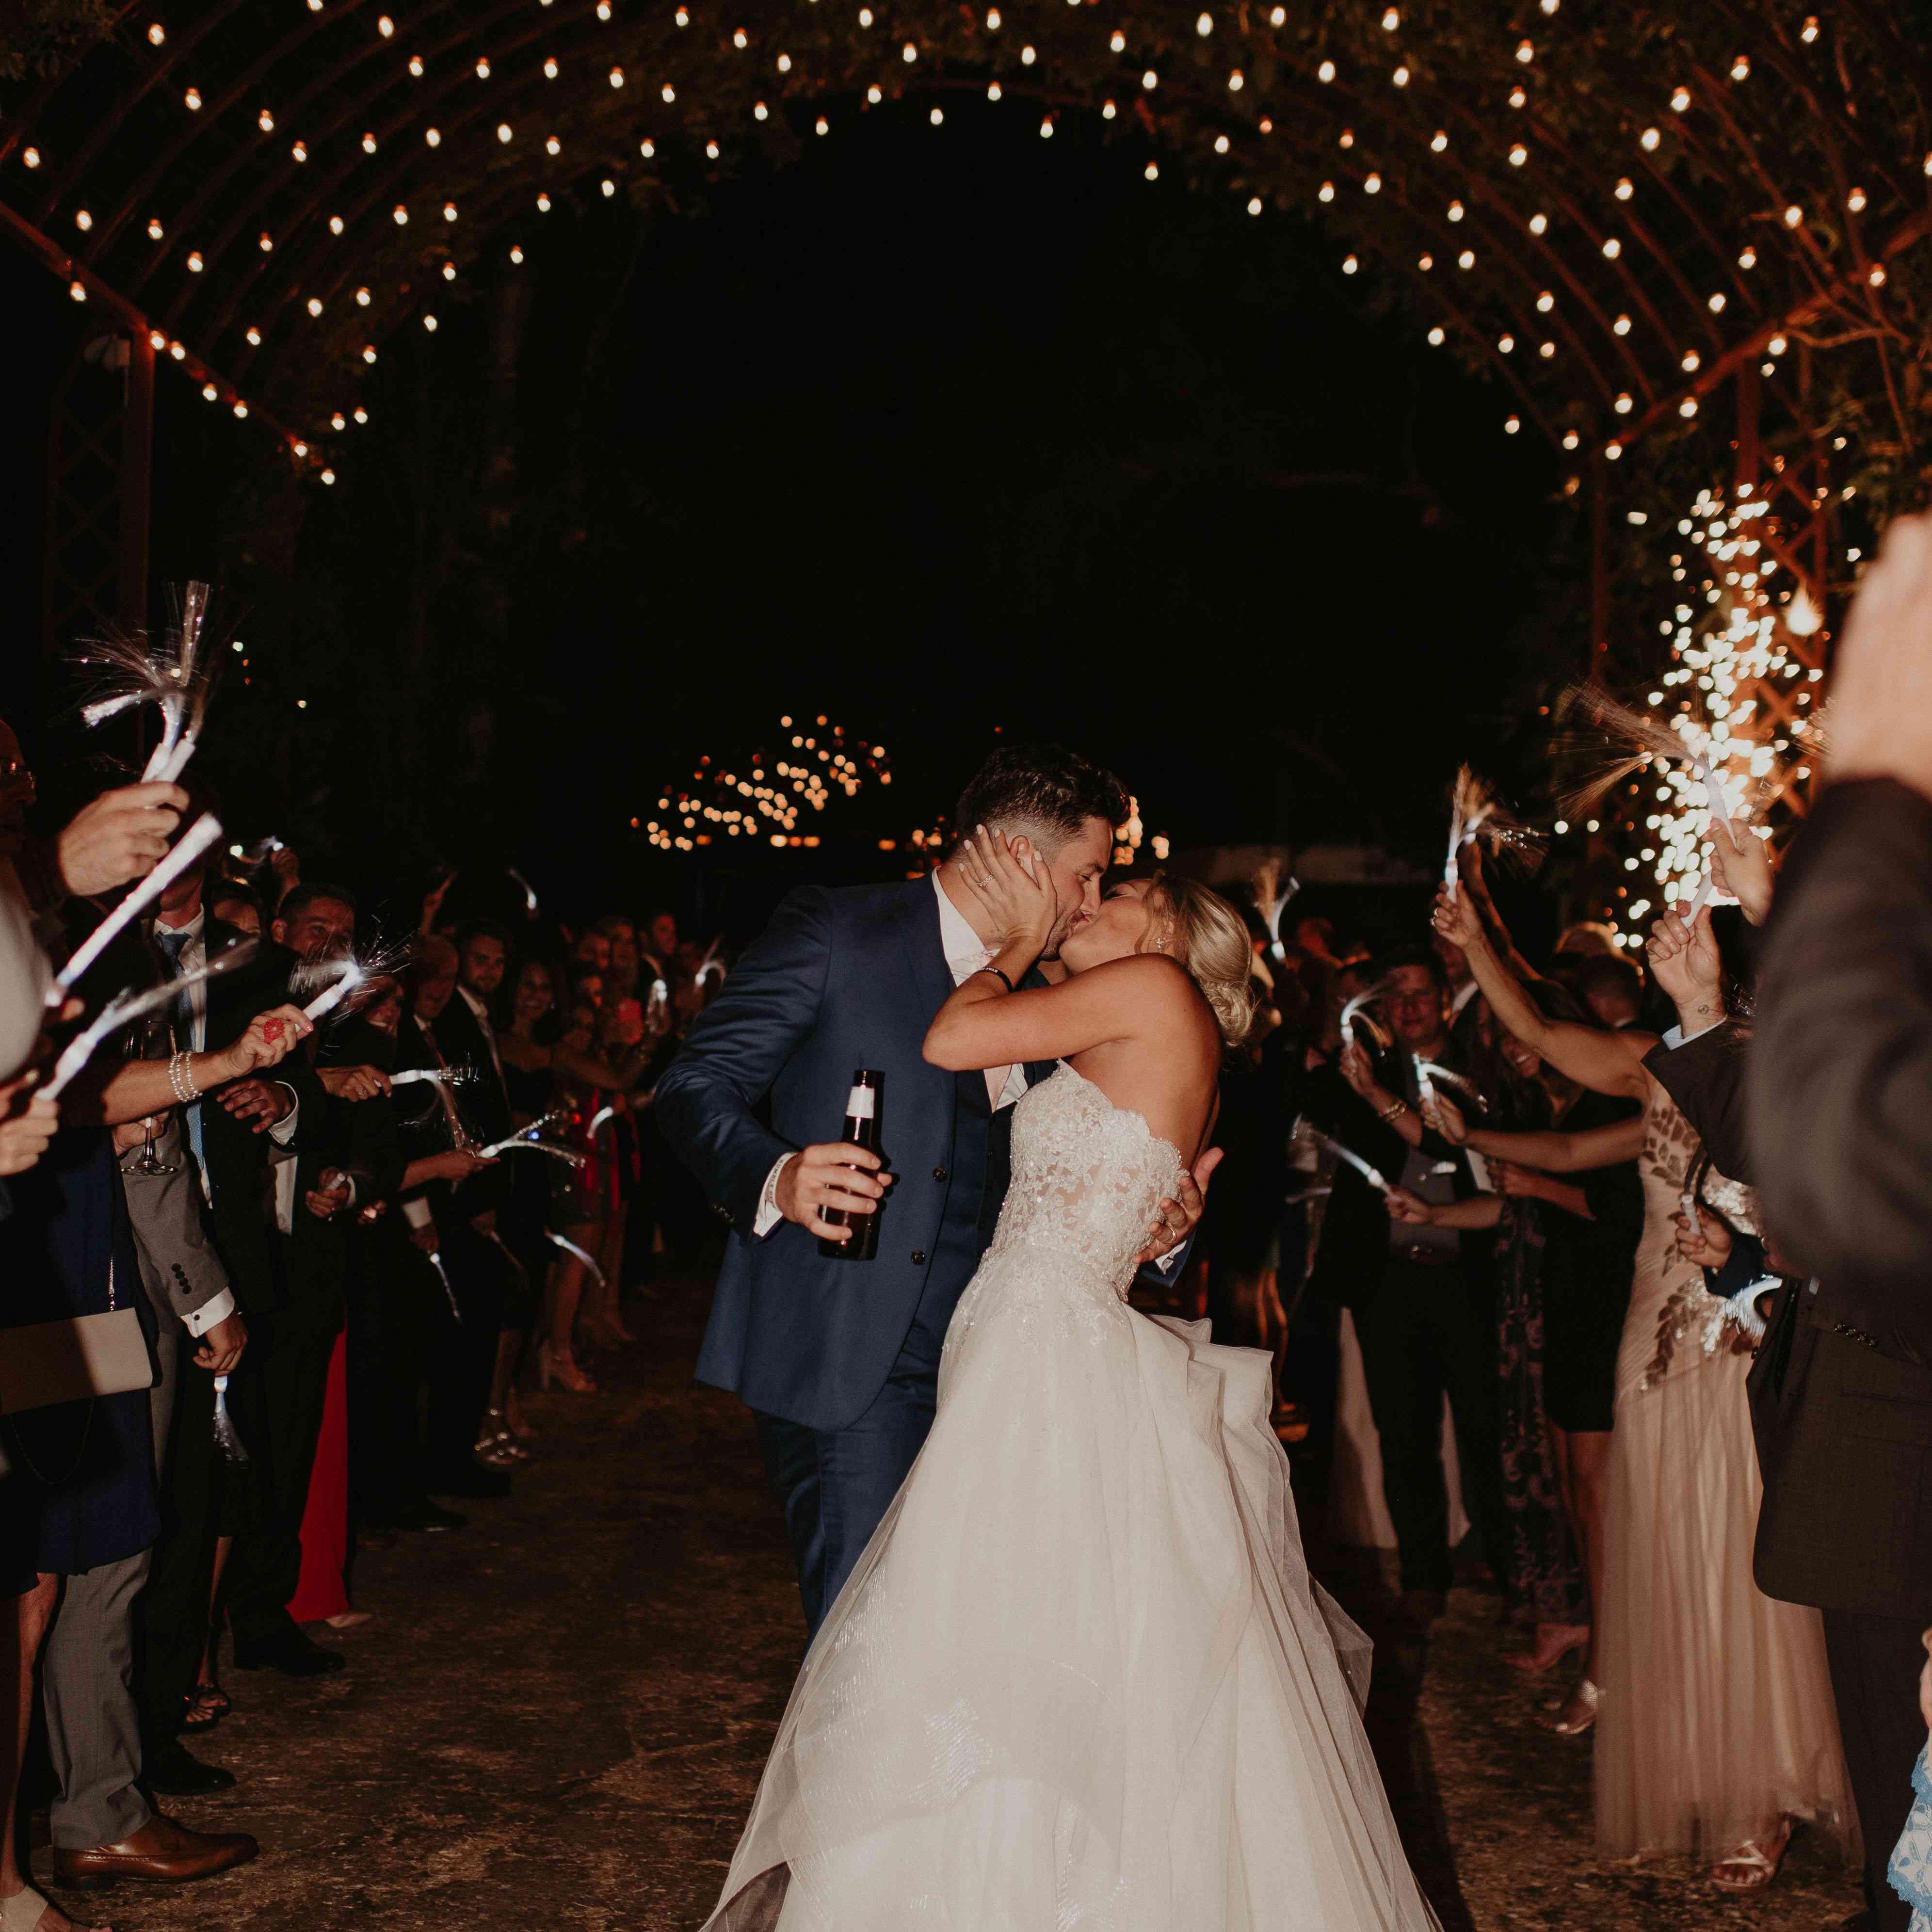 Baker Mayfield Wedding, exit